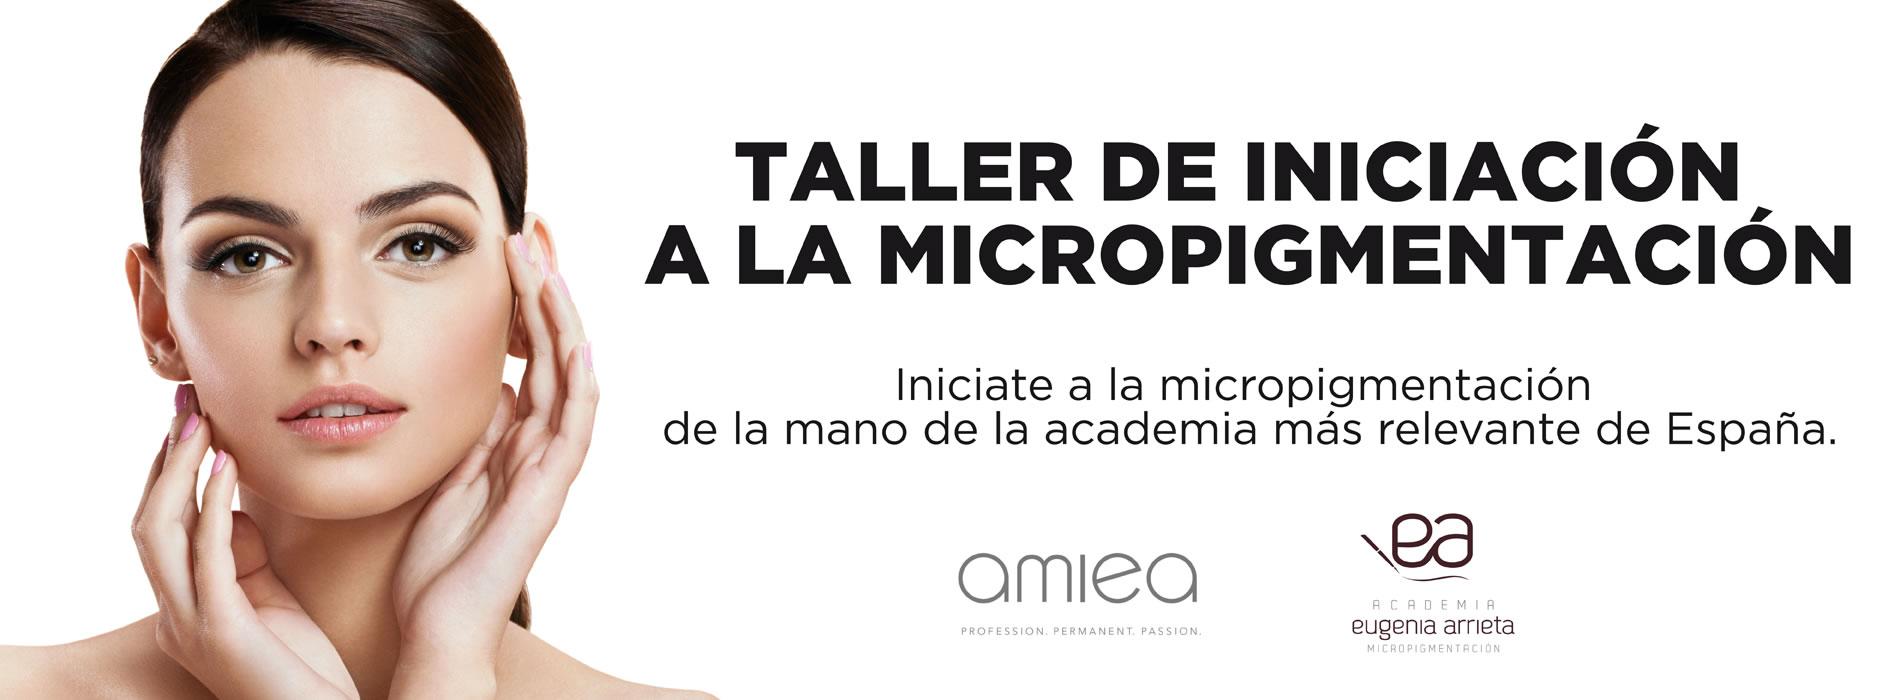 Cosmobeauty Barcelona - Taller de Iniciacion a la Micropigmentacion